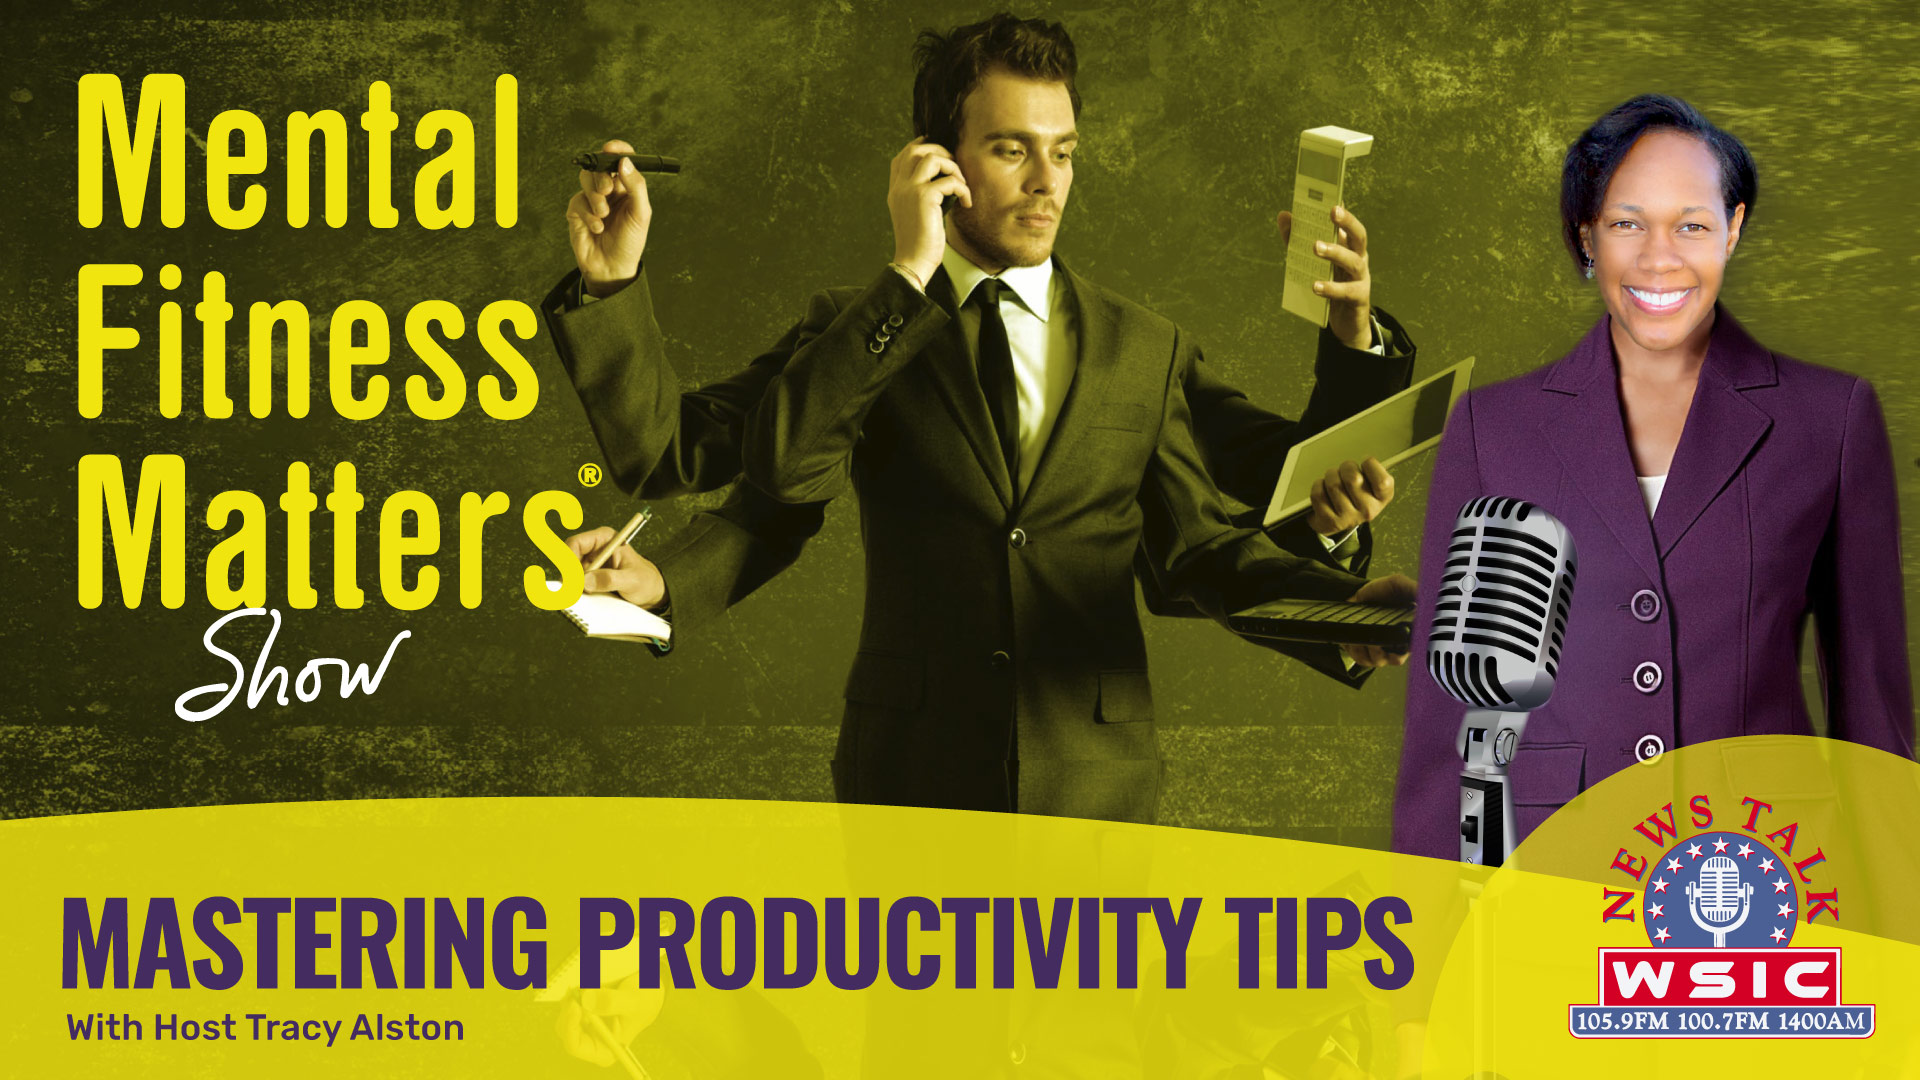 Mastering Productivity Tips